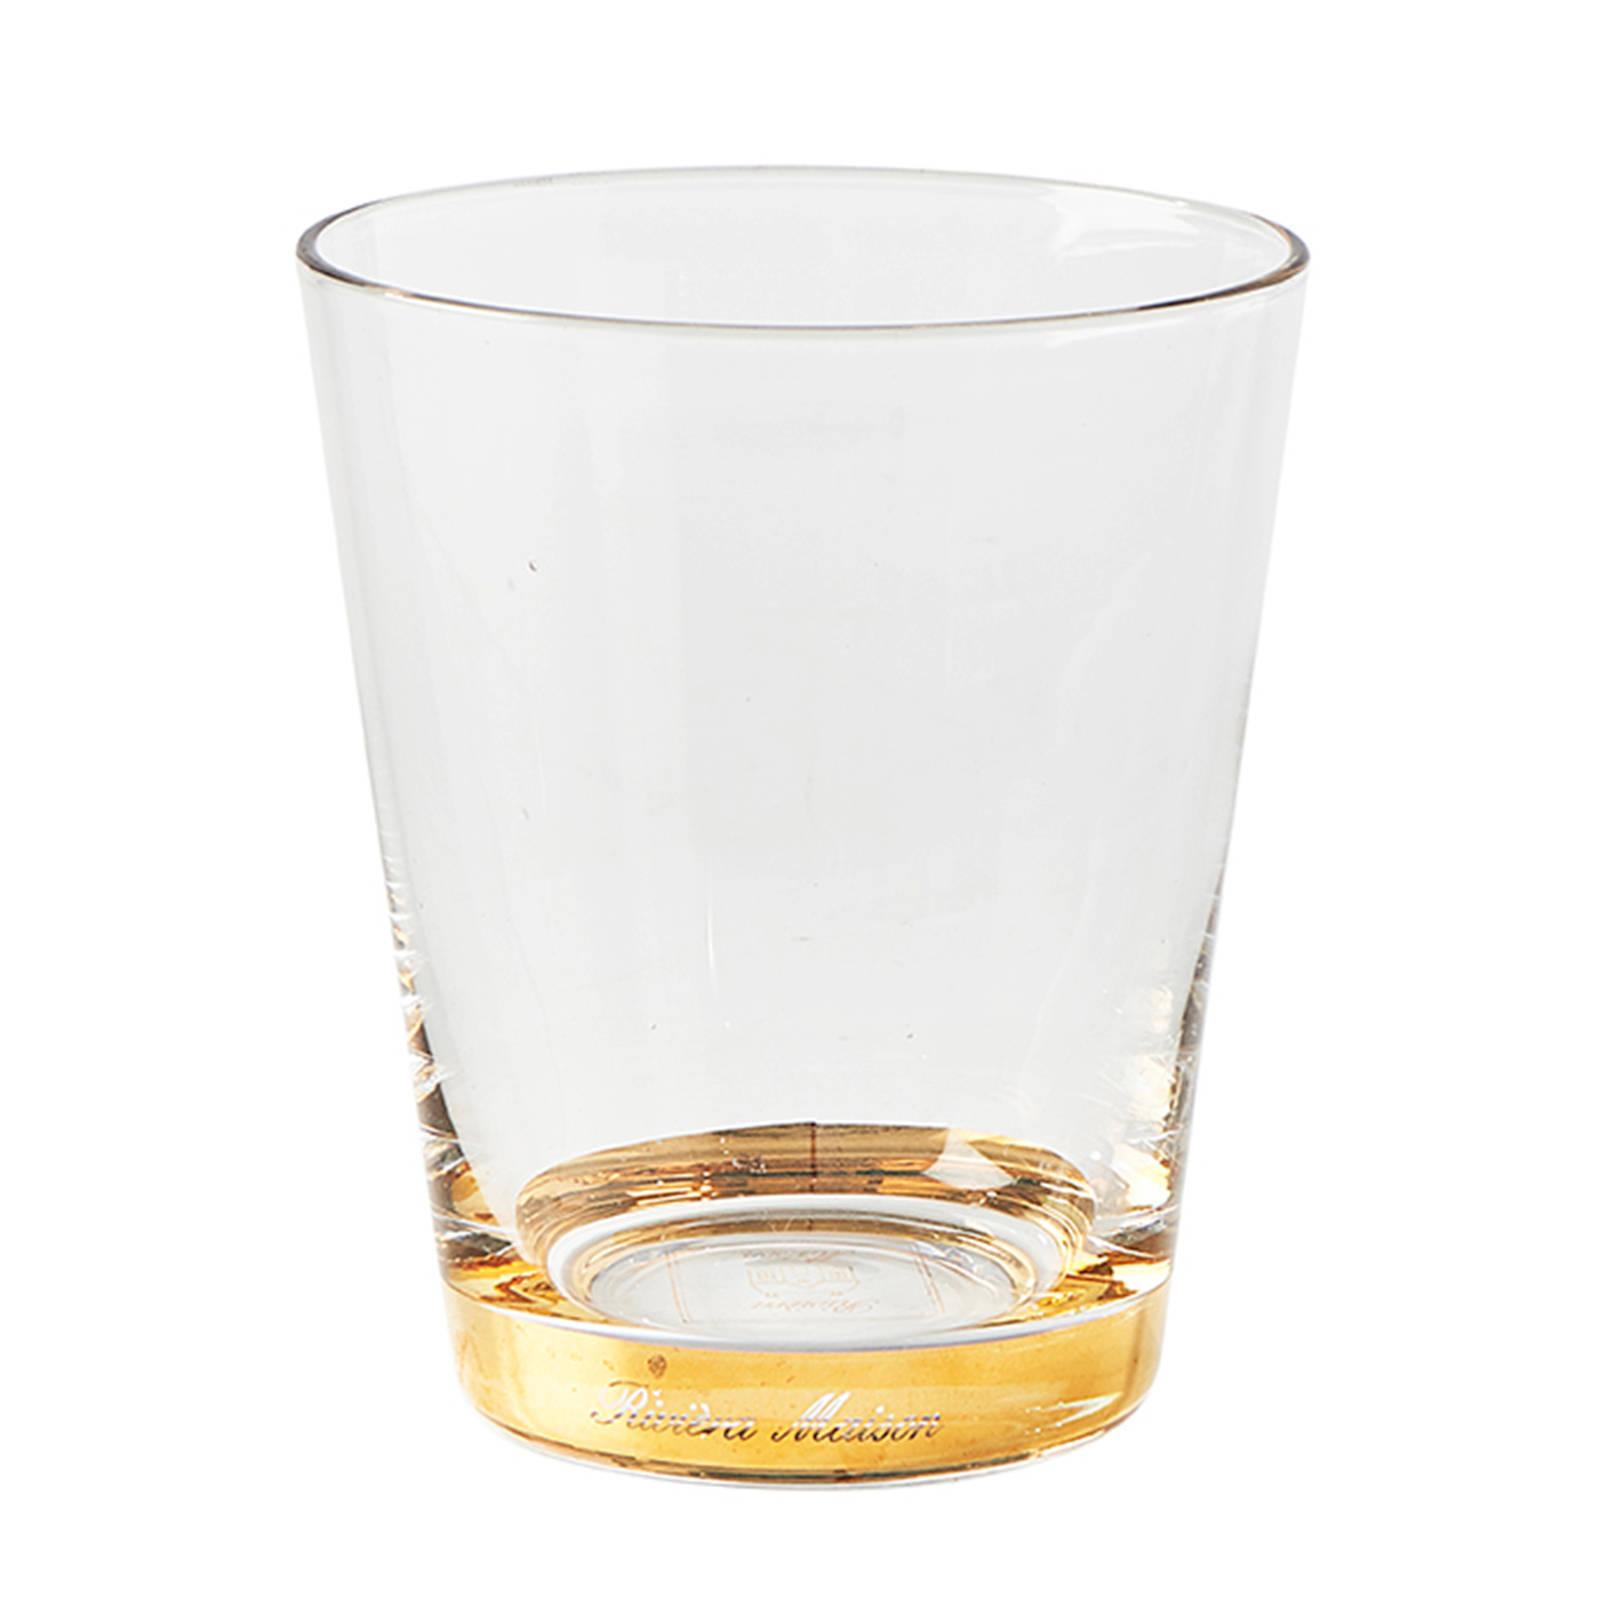 Riviera Maison Fifth Avenue waterglas (Ø8 cm)